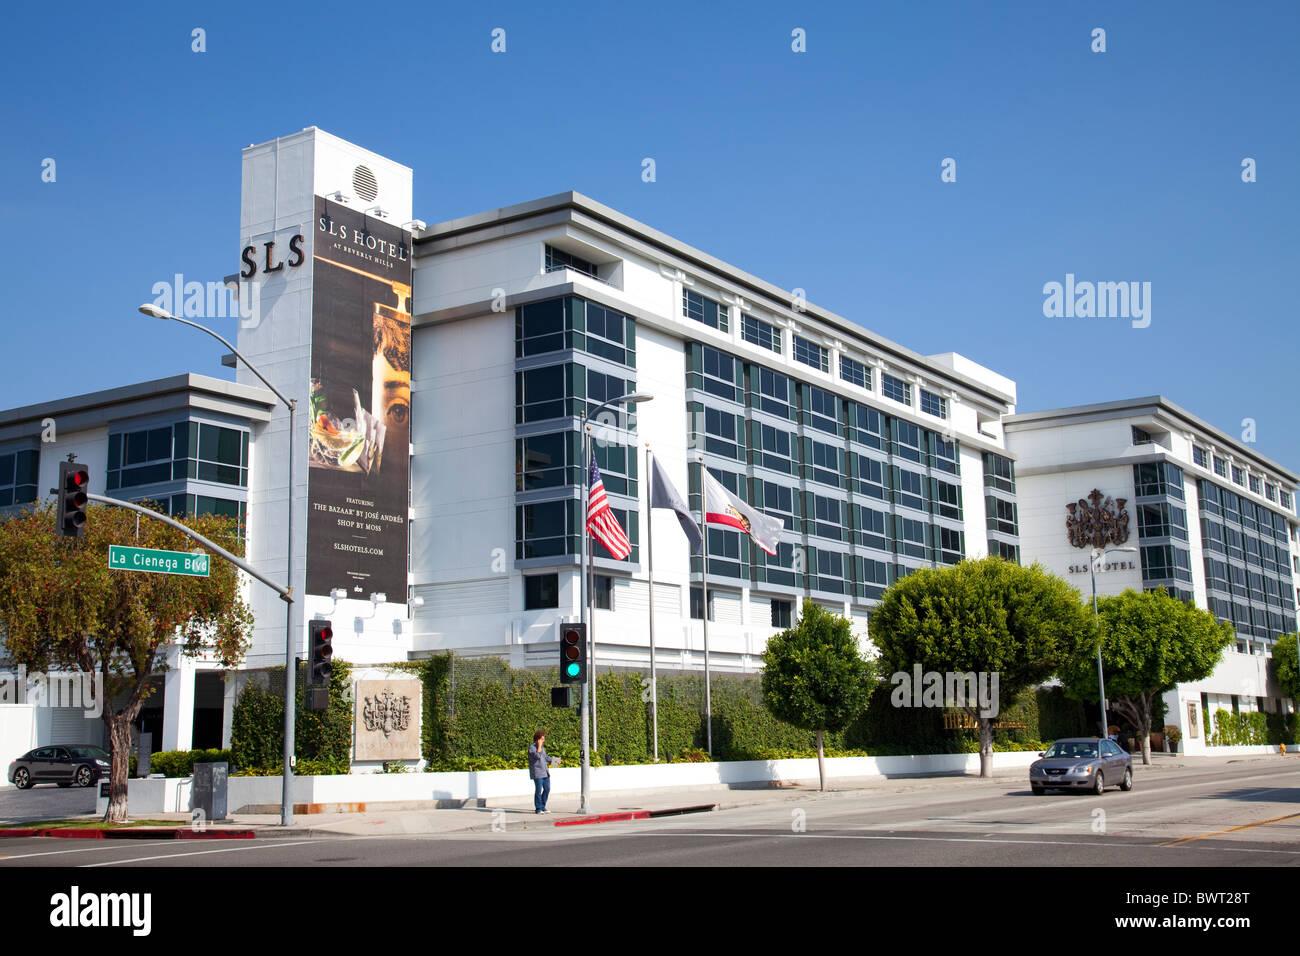 Sls hotel at beverly hills la cienega blvd los angeles california usa